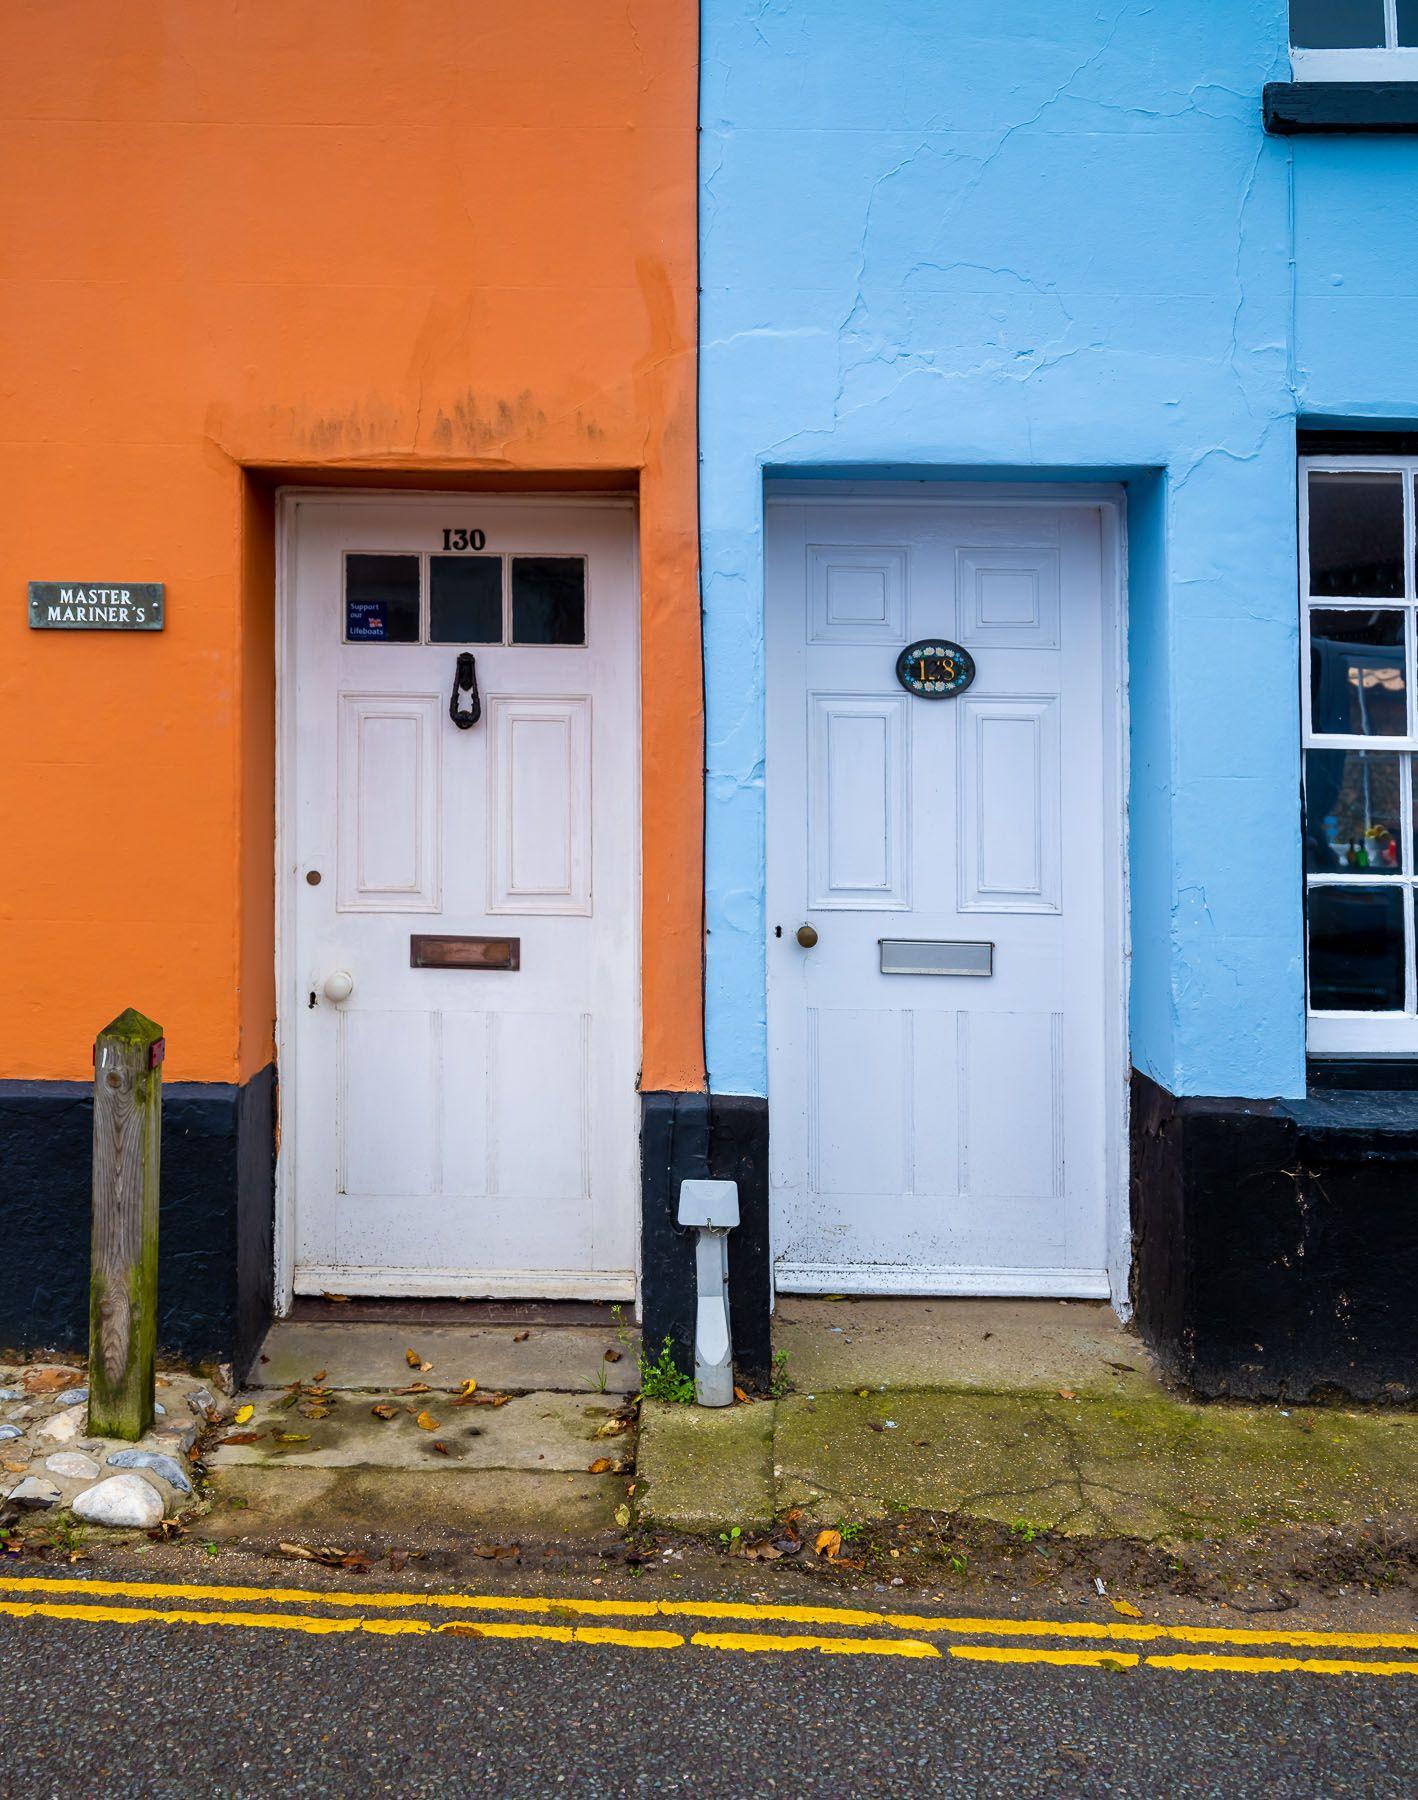 Blakeney, UK